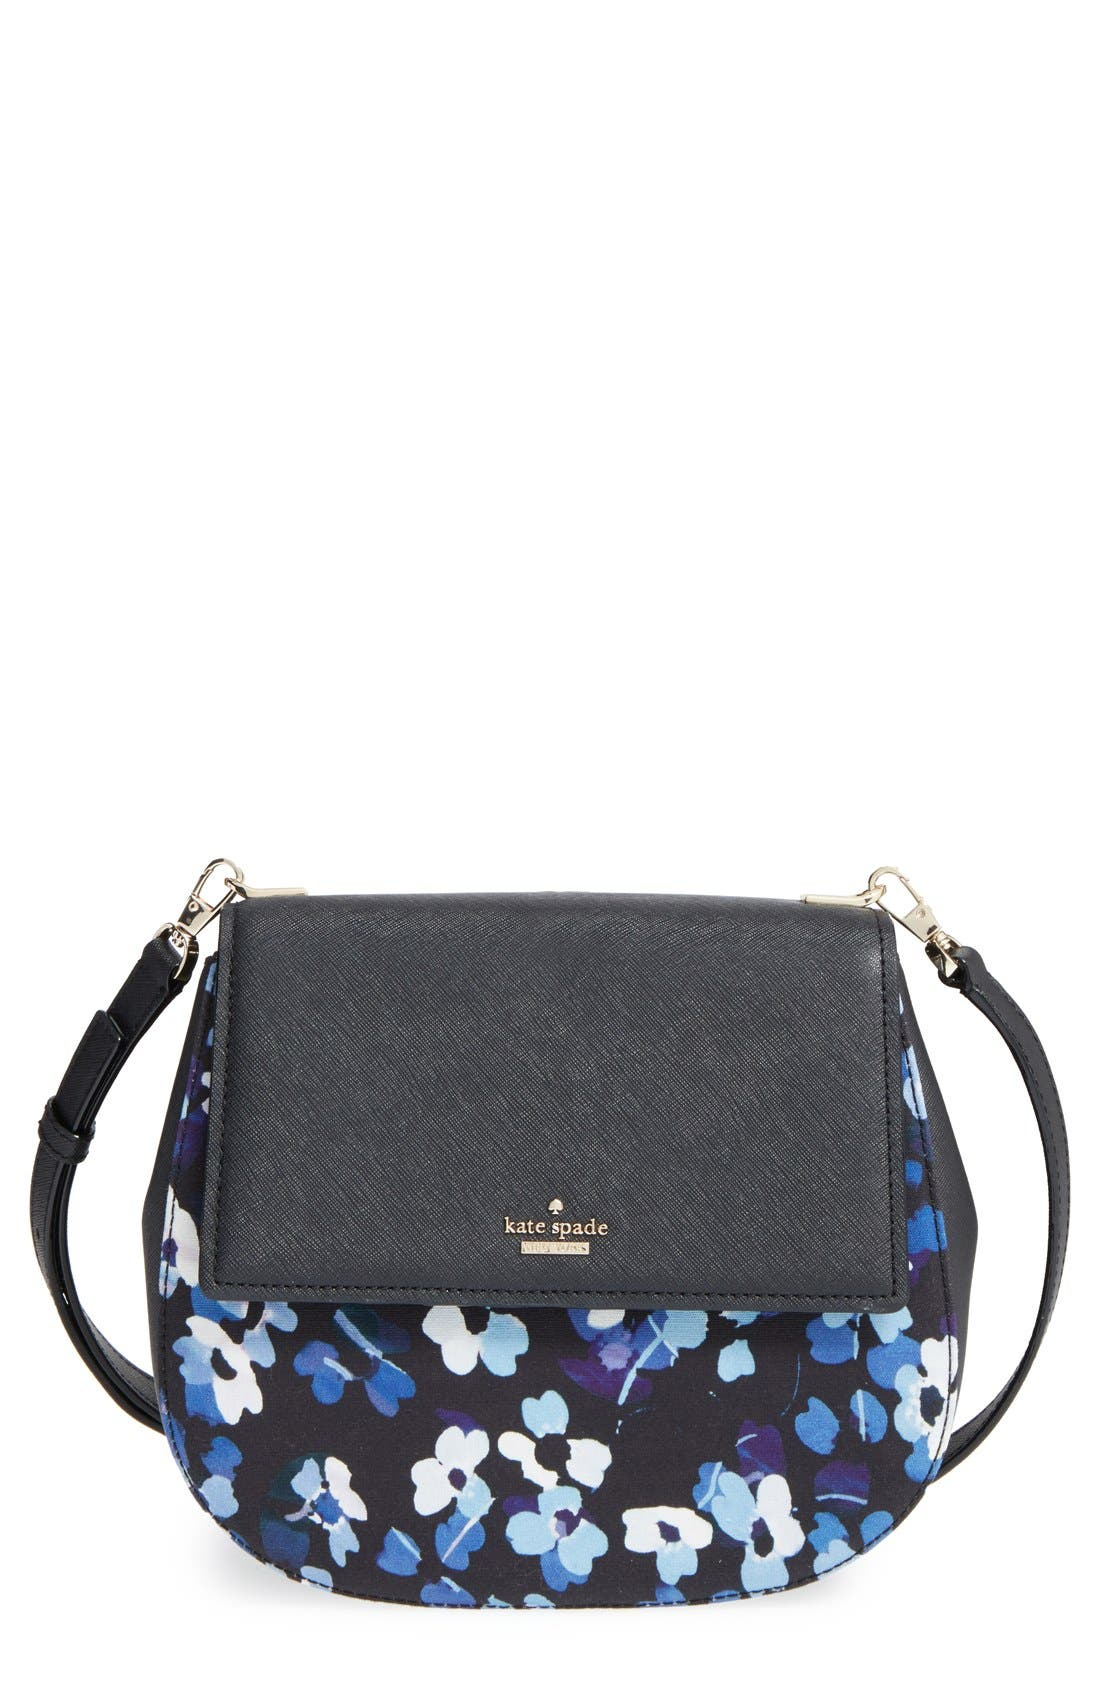 Kate Spade New York U0026#39;cameron Street - Byrdieu0026#39; Floral Print Cotton U0026 Leather Crossbody Bag ...